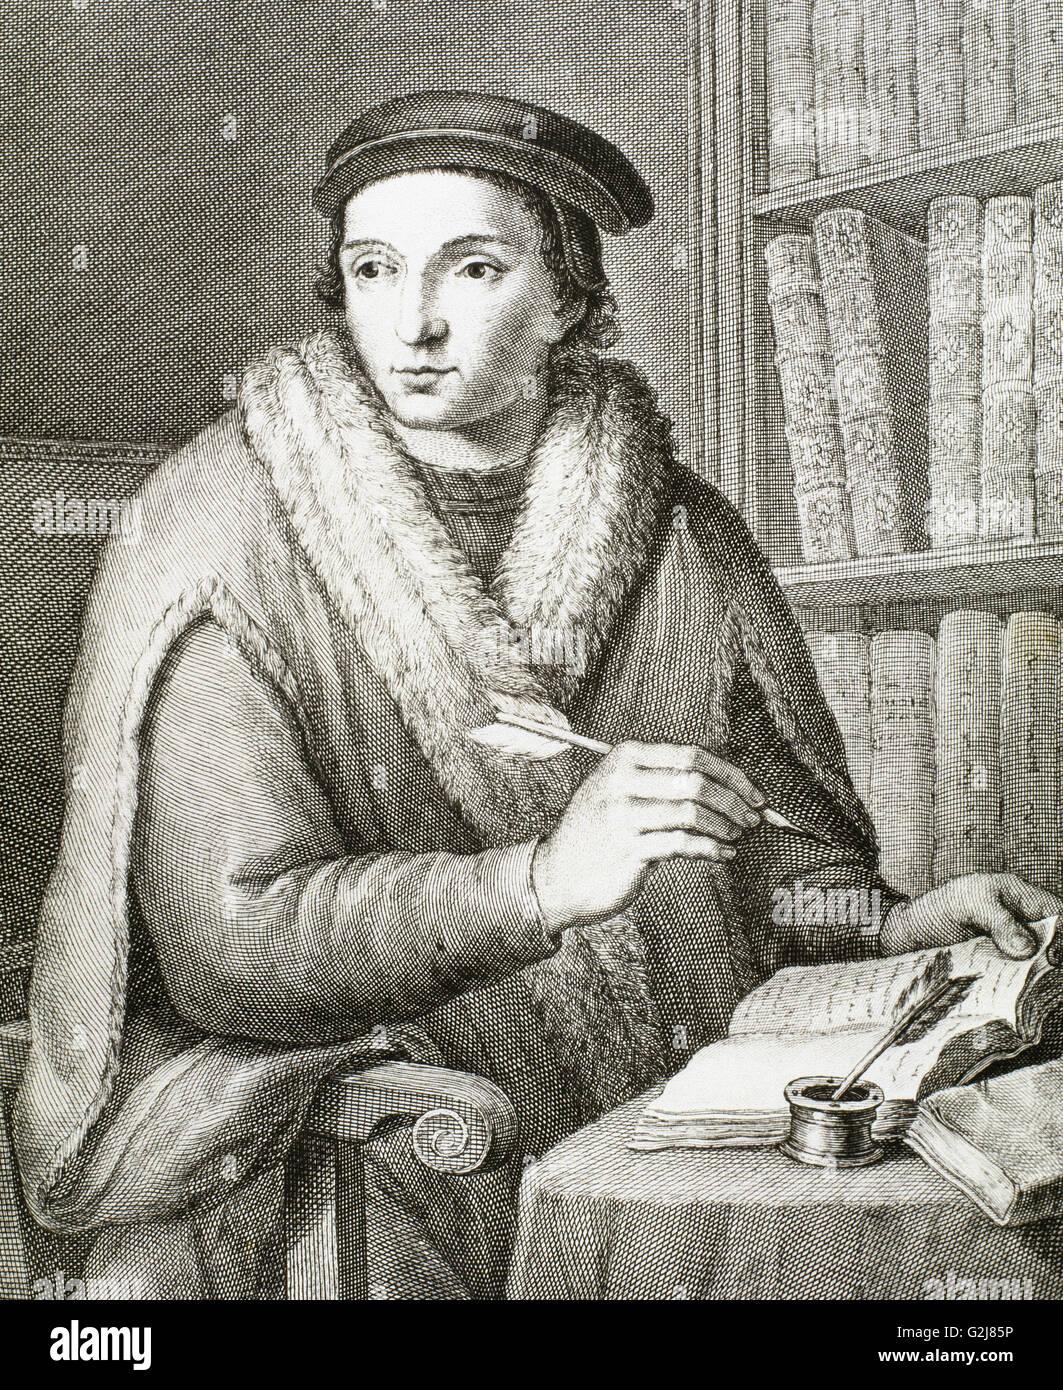 Juan Luis Vives (1493-1540). Valencian scholar and humanist. Portrait. Engraving. - Stock Image